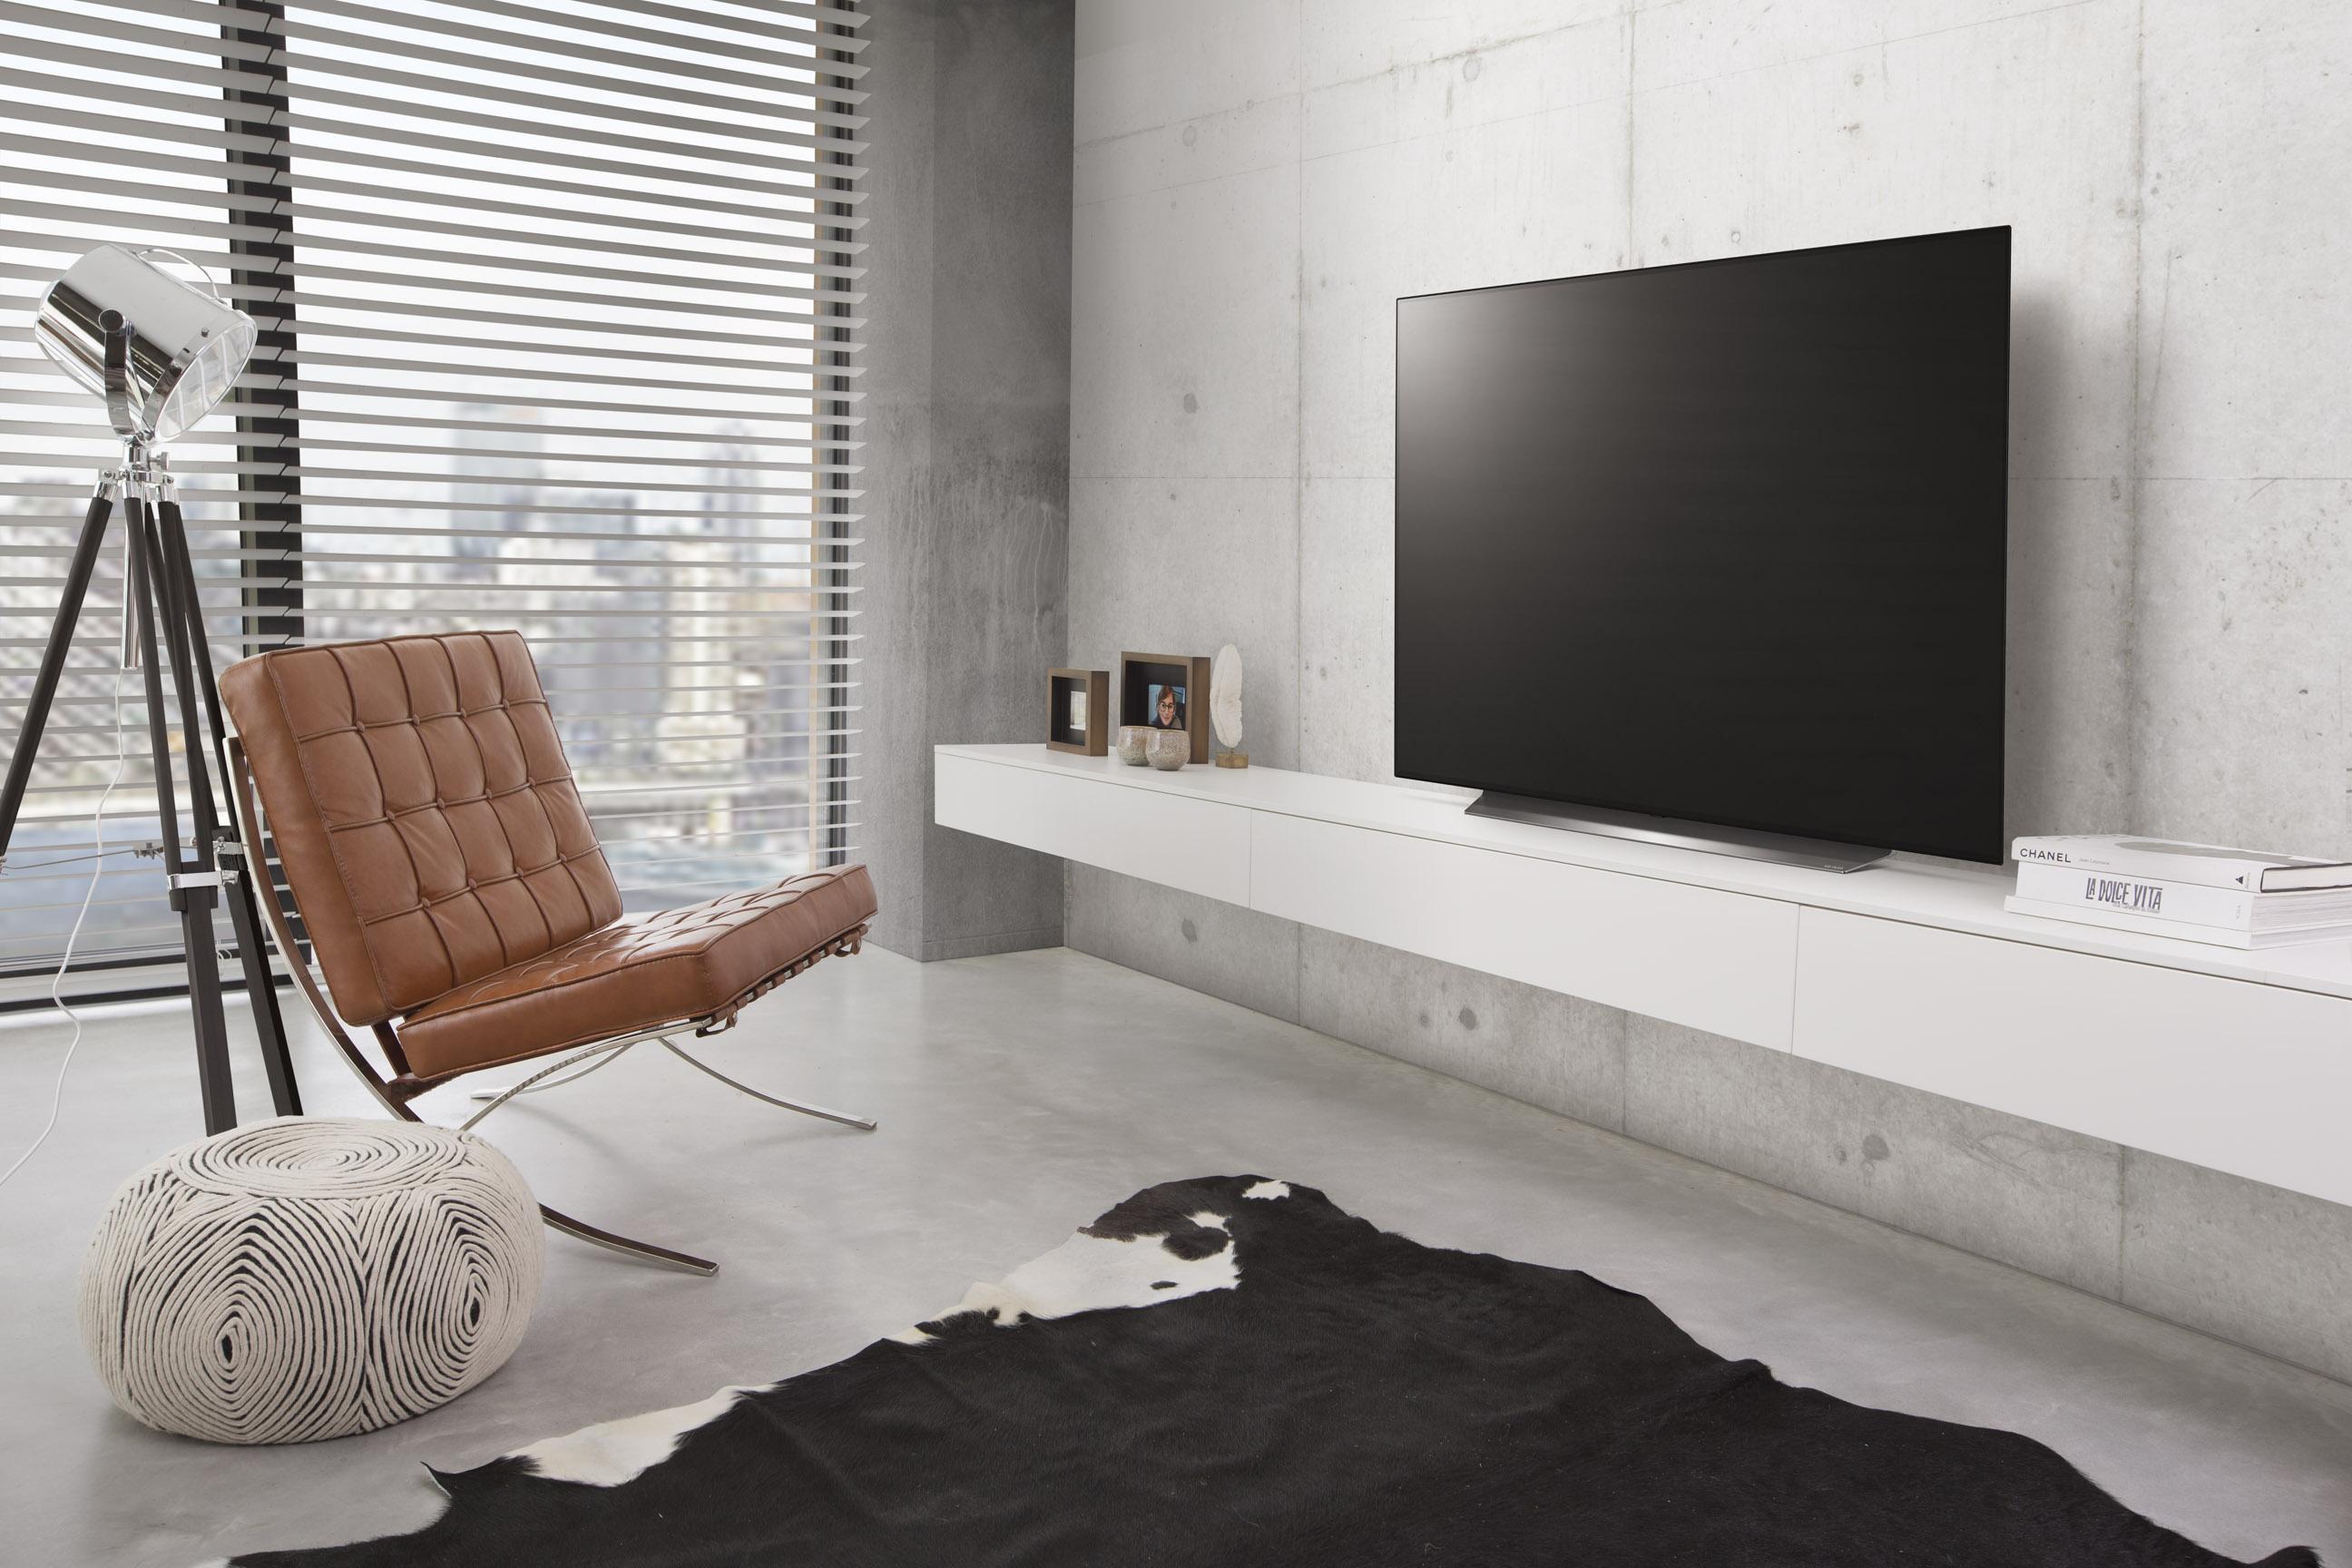 Beroemd Je mooie LG tv nu nog mooier met een LG OLED muurbeugel | Vogel's &NF79